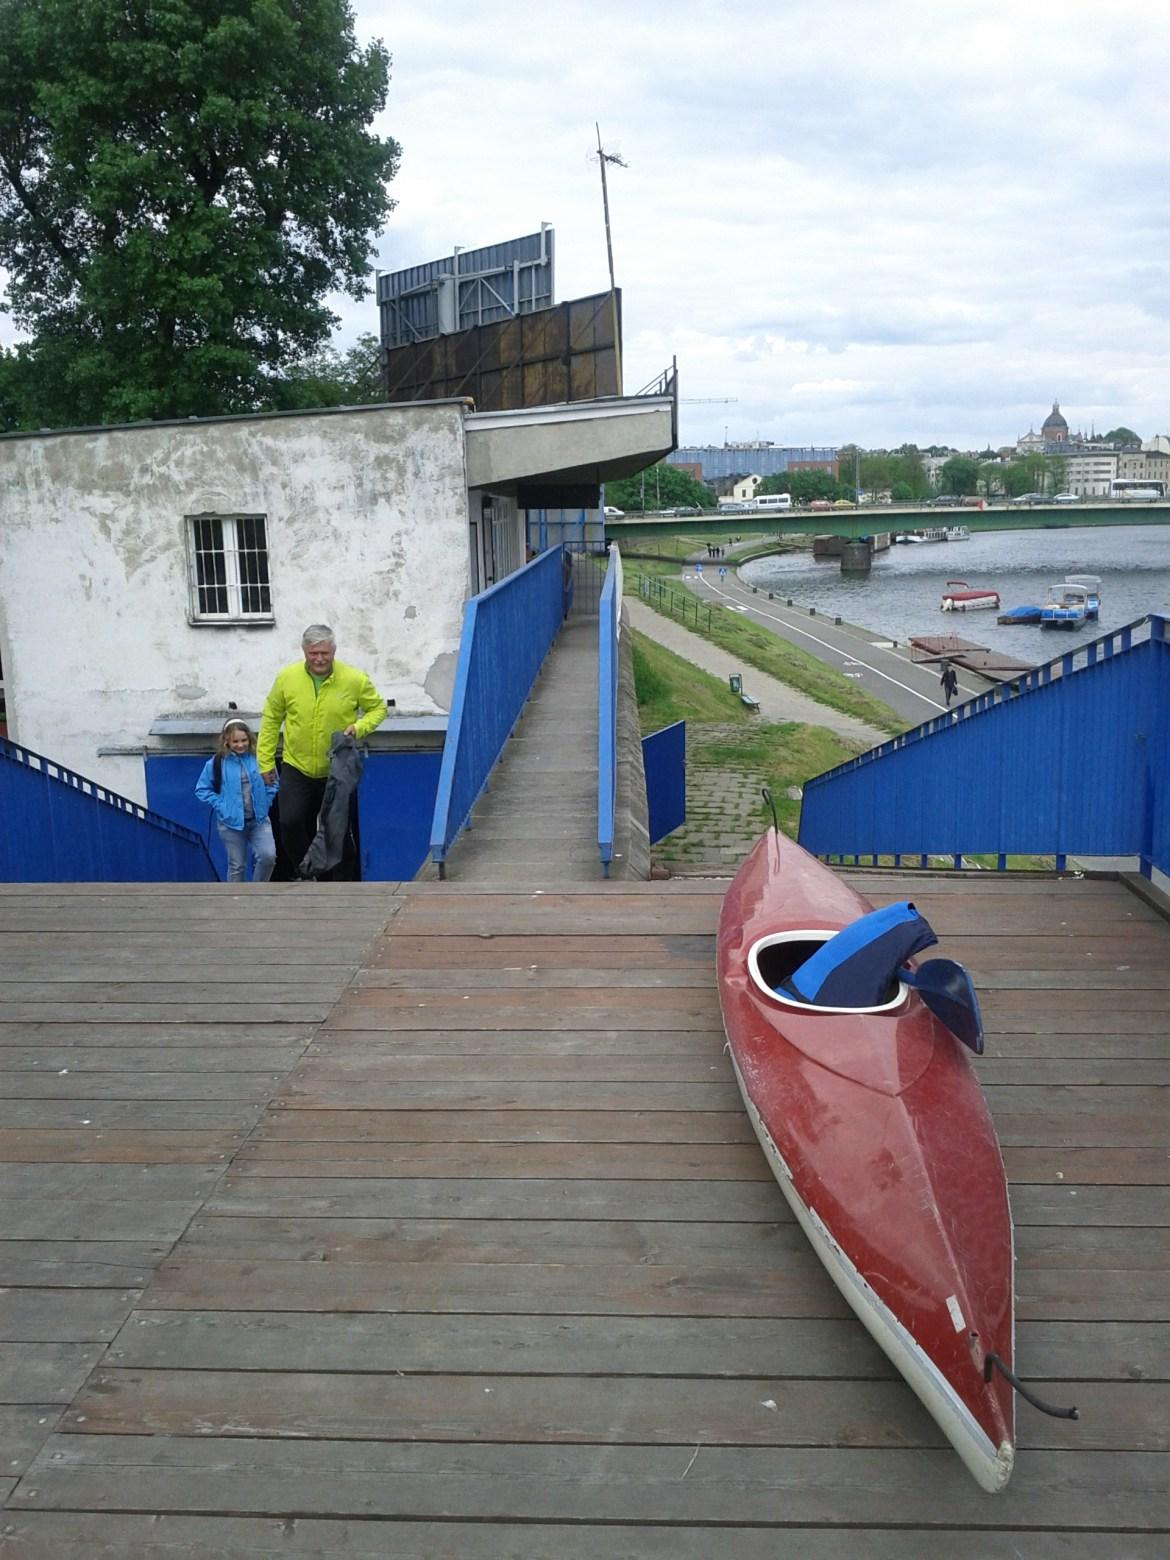 Kayak rental on the Wisla River in Krakow, Poland